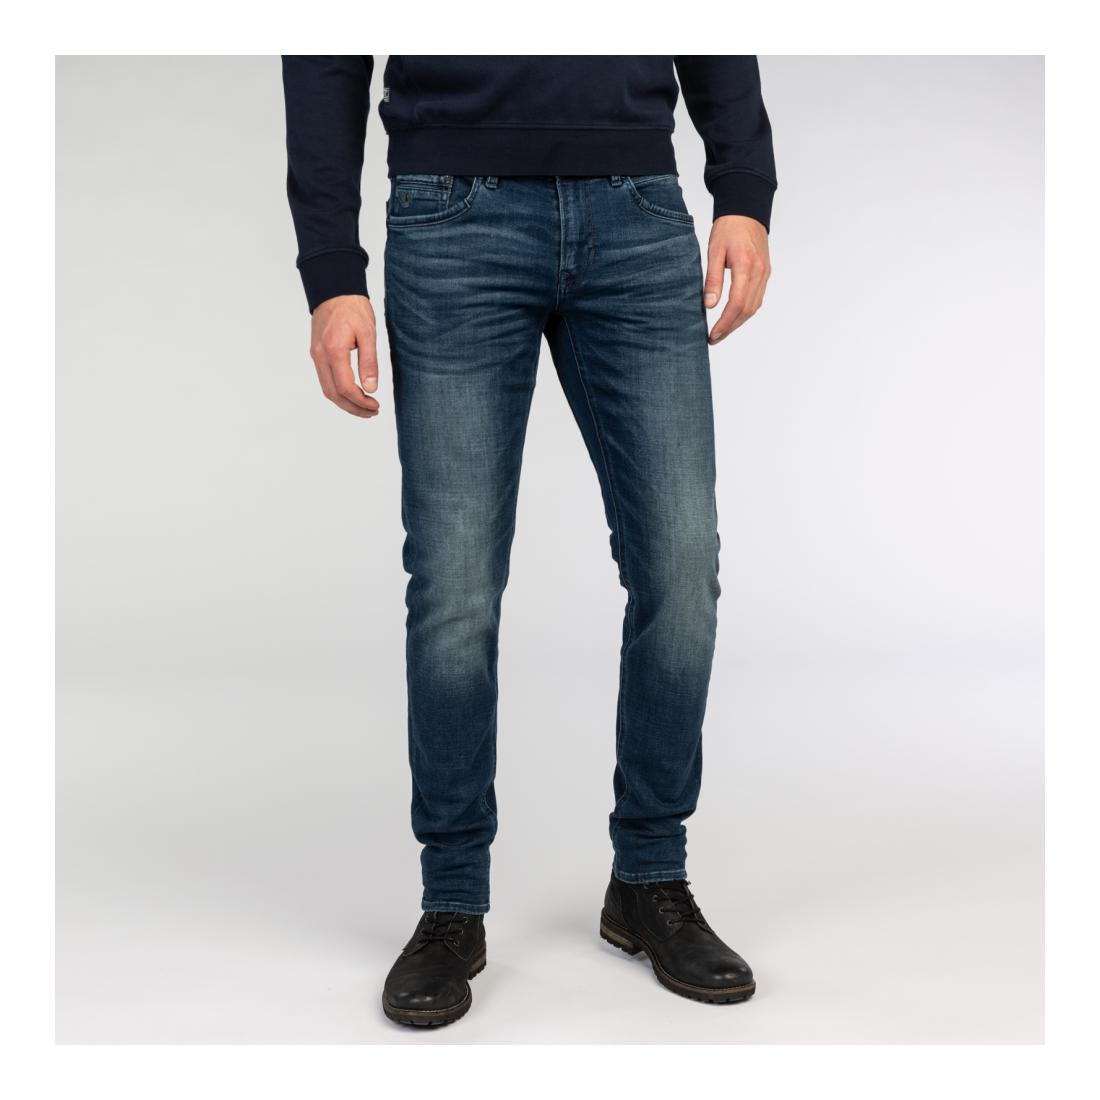 PME Legend Jeans Herren TAILWHEEL DARK BLUE INDIG